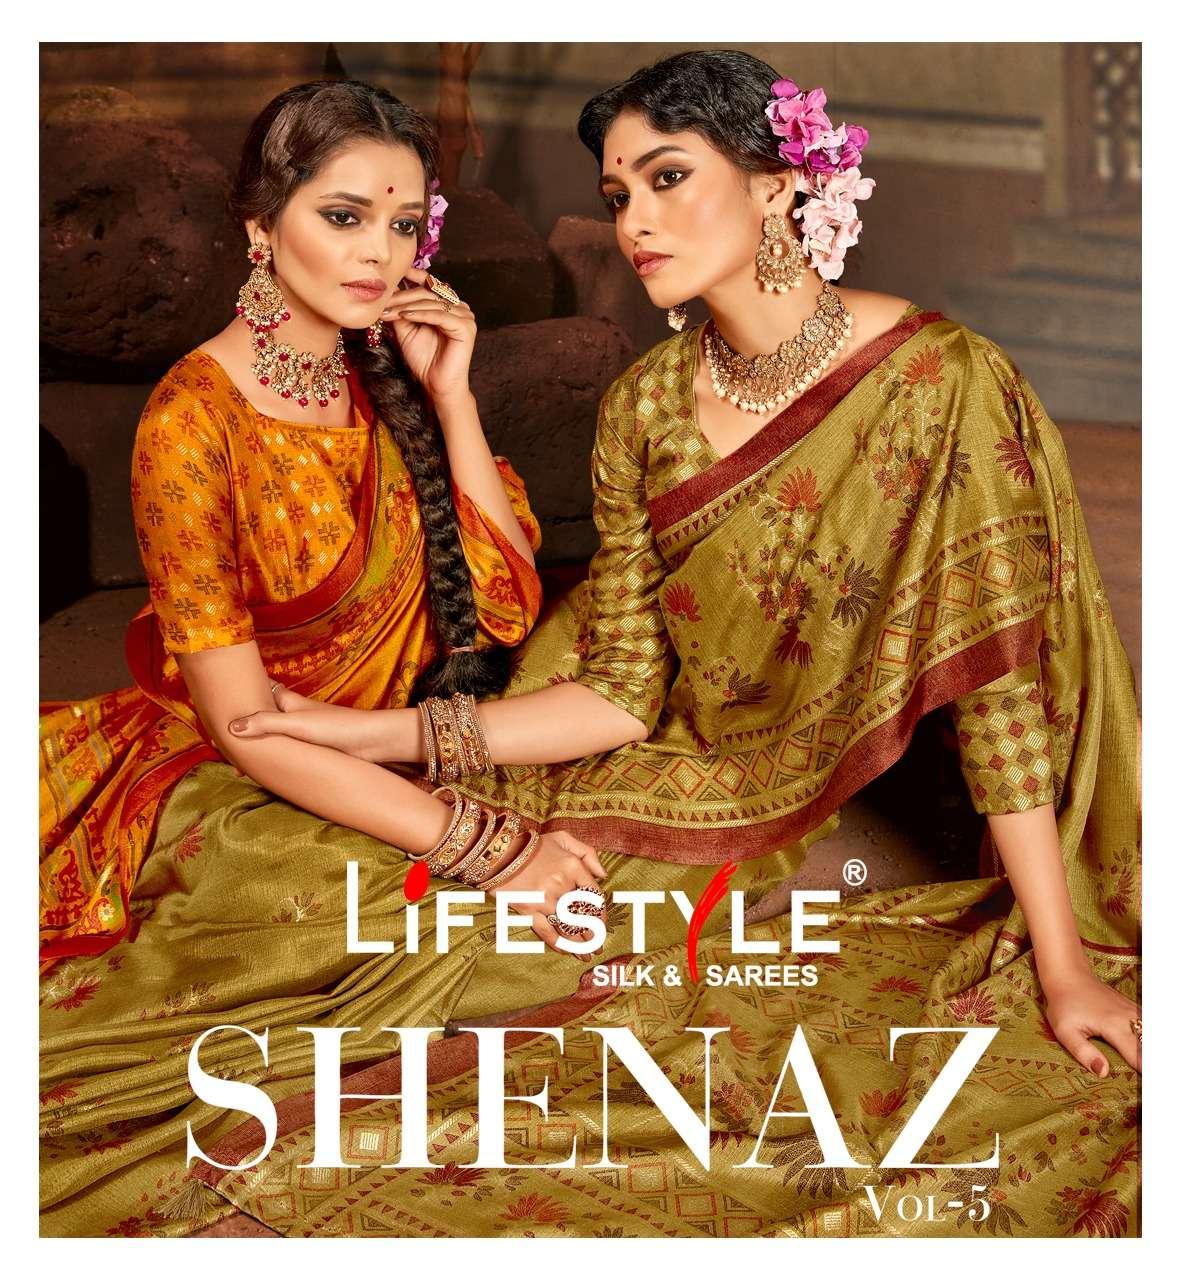 lifestyle shenaz vol 5 fancy sarees collection